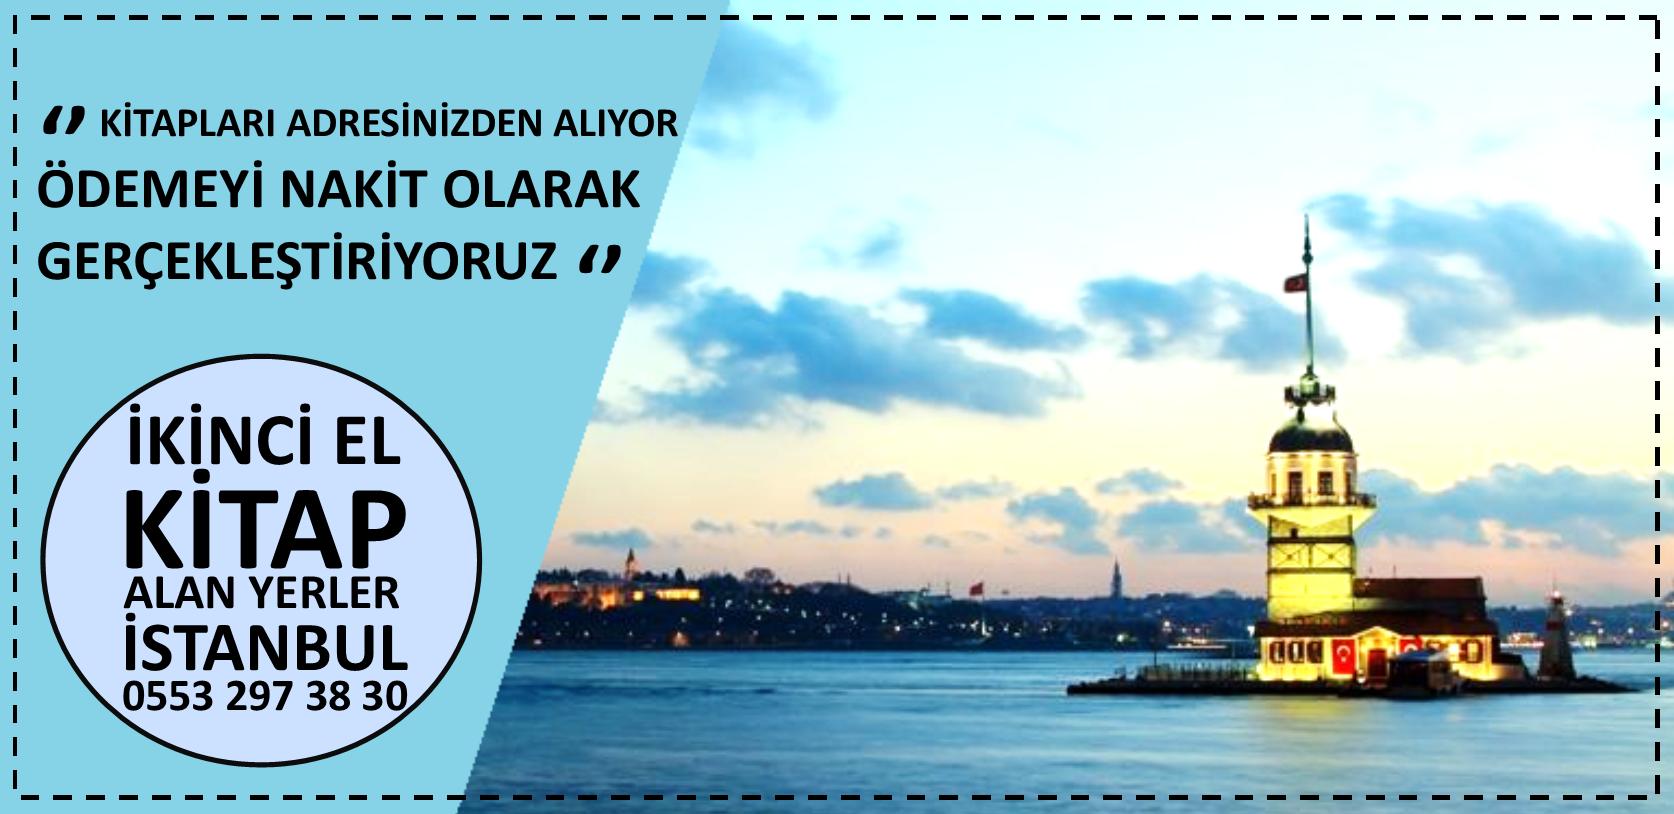 Ikinci El Kitap Alan Yerler Istanbul 0553 297 38 30